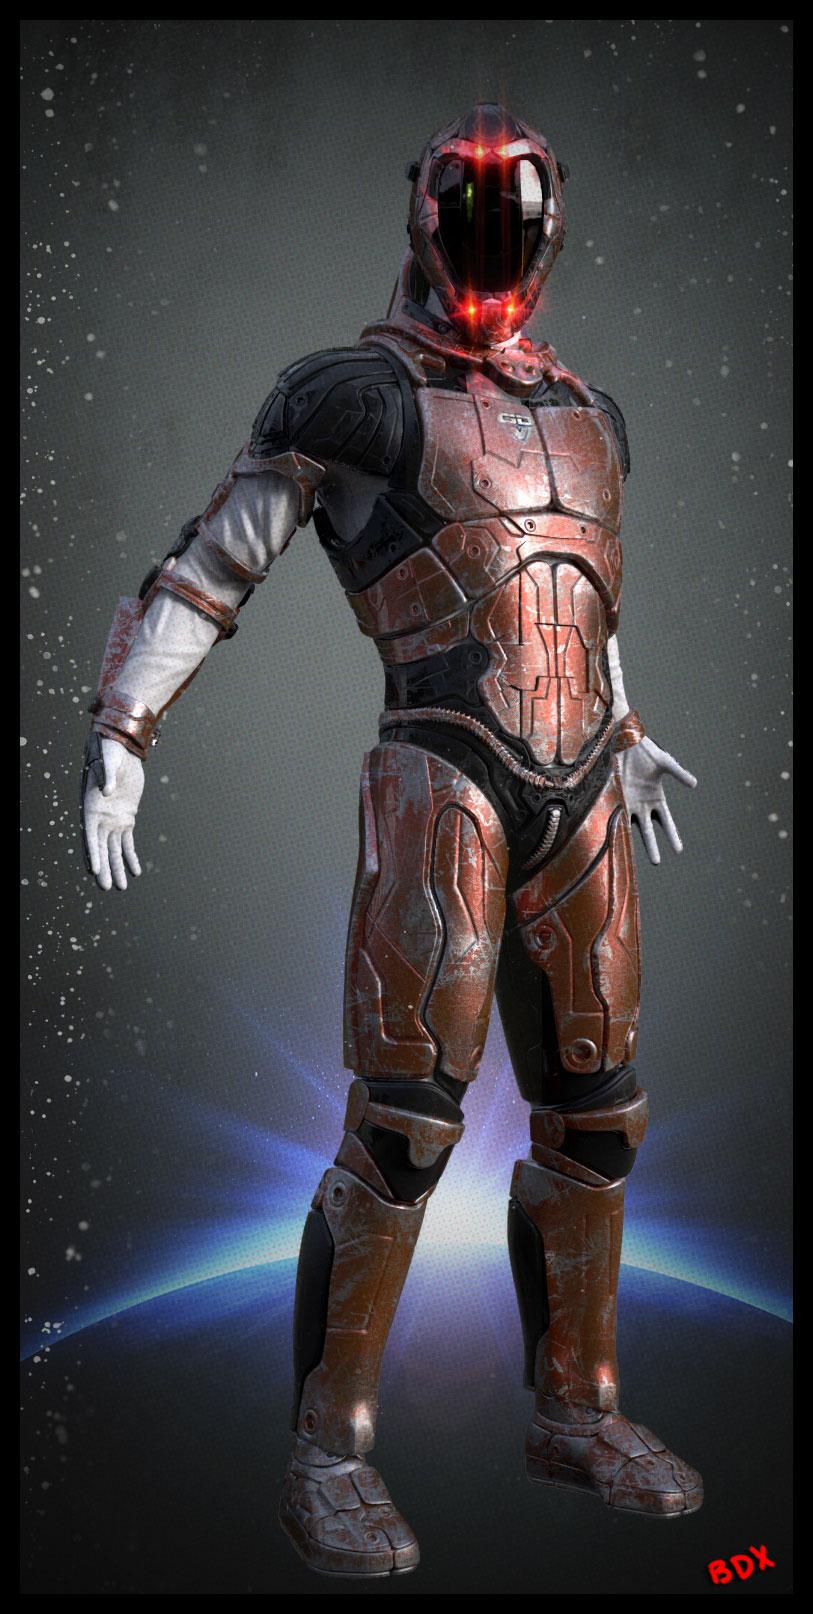 Armure Futuriste armure futuriste zbrush